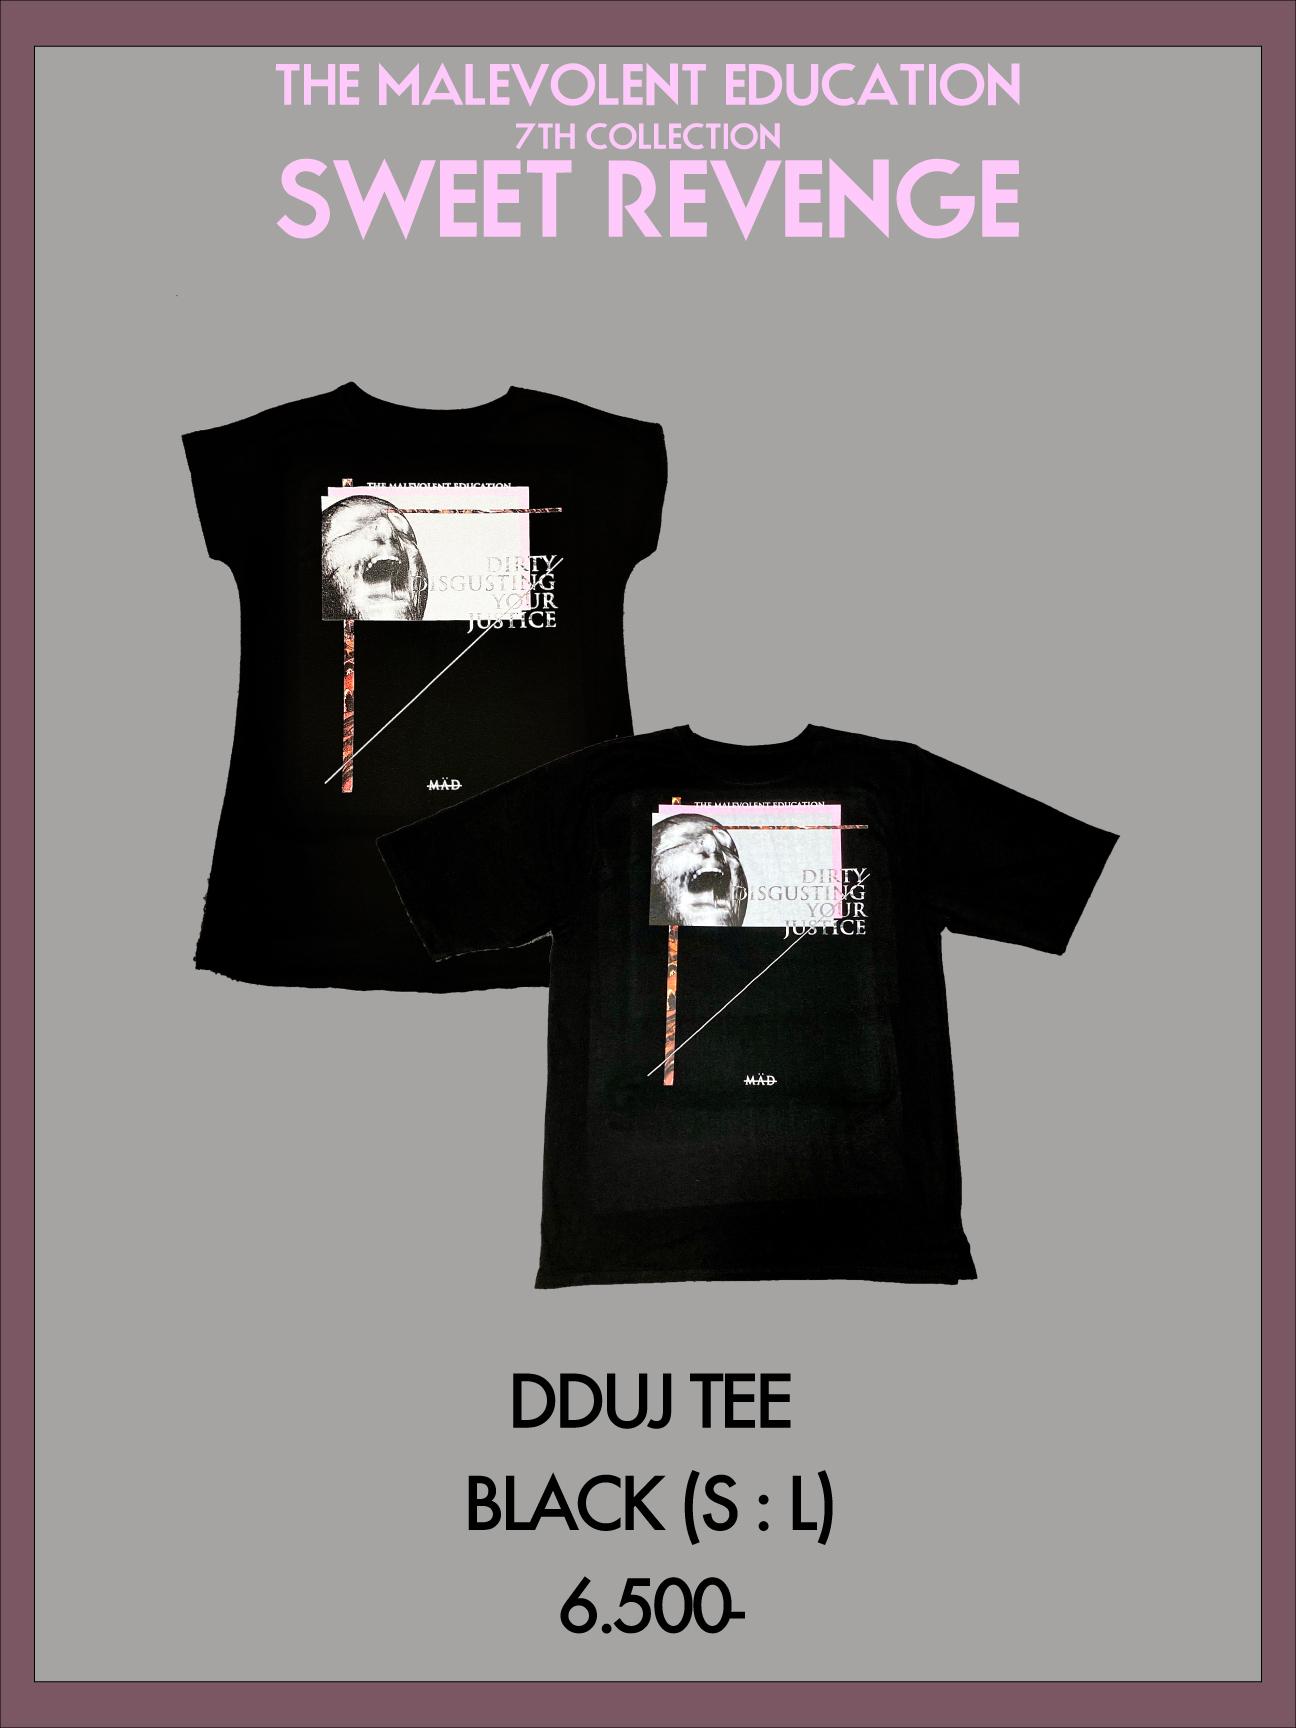 DDUJ TEE (BLACK) S / L